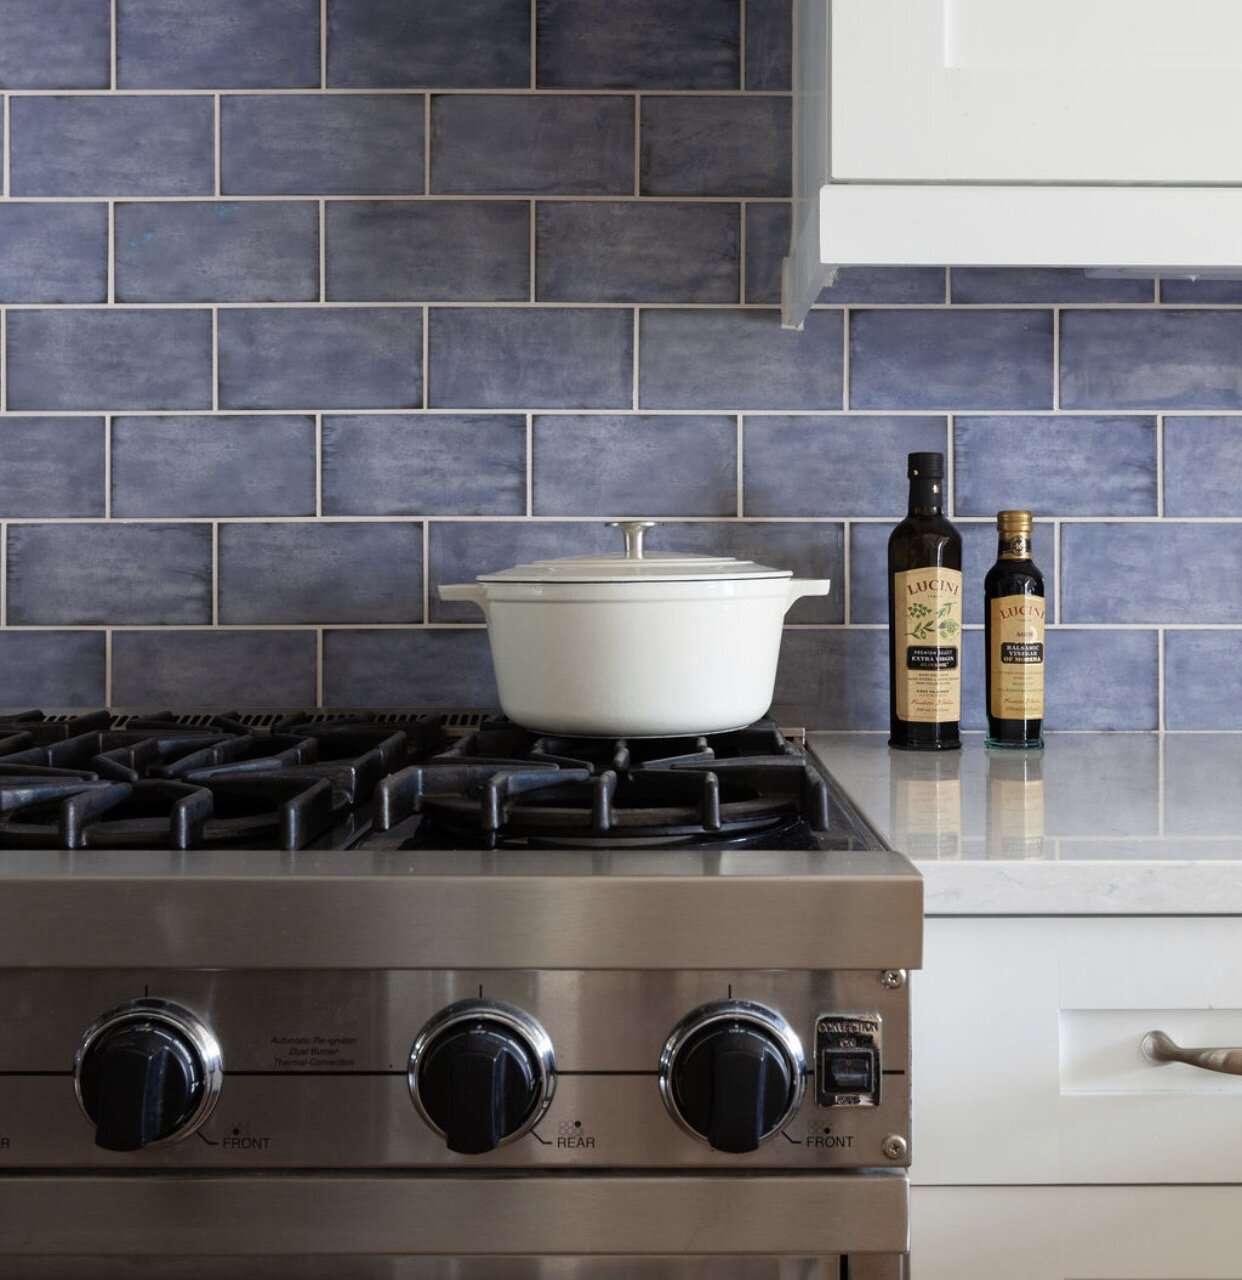 best kitchen ideas - blue subway tiles